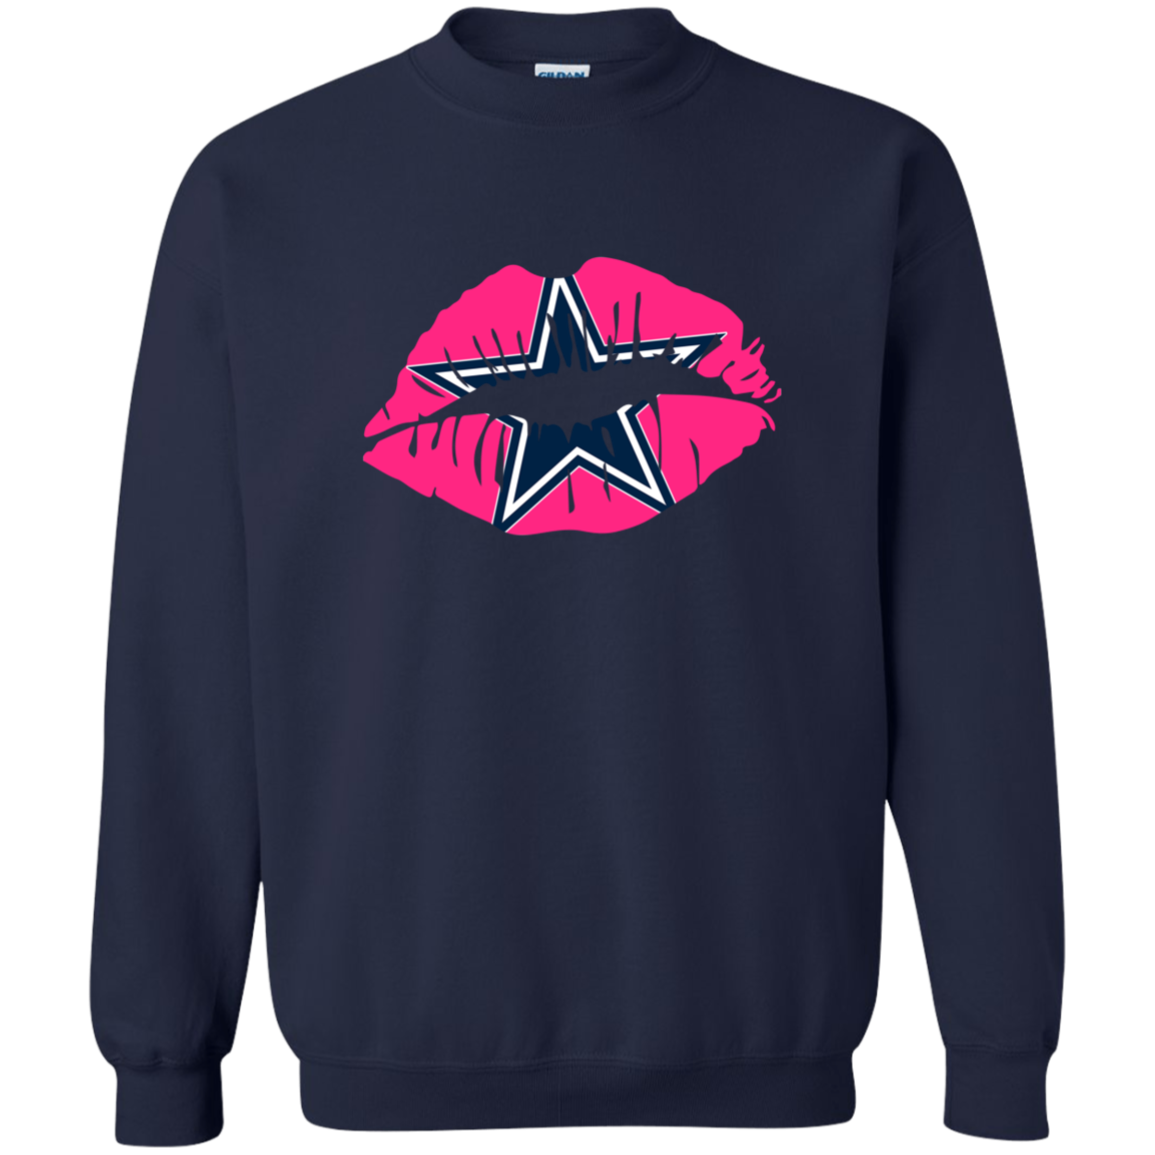 Dallas Cowboys T Shirts Kissing Lip Hoodies Sweatshirts Sweatshirts Hoodie Sweatshirts Shirts [ 1155 x 1155 Pixel ]